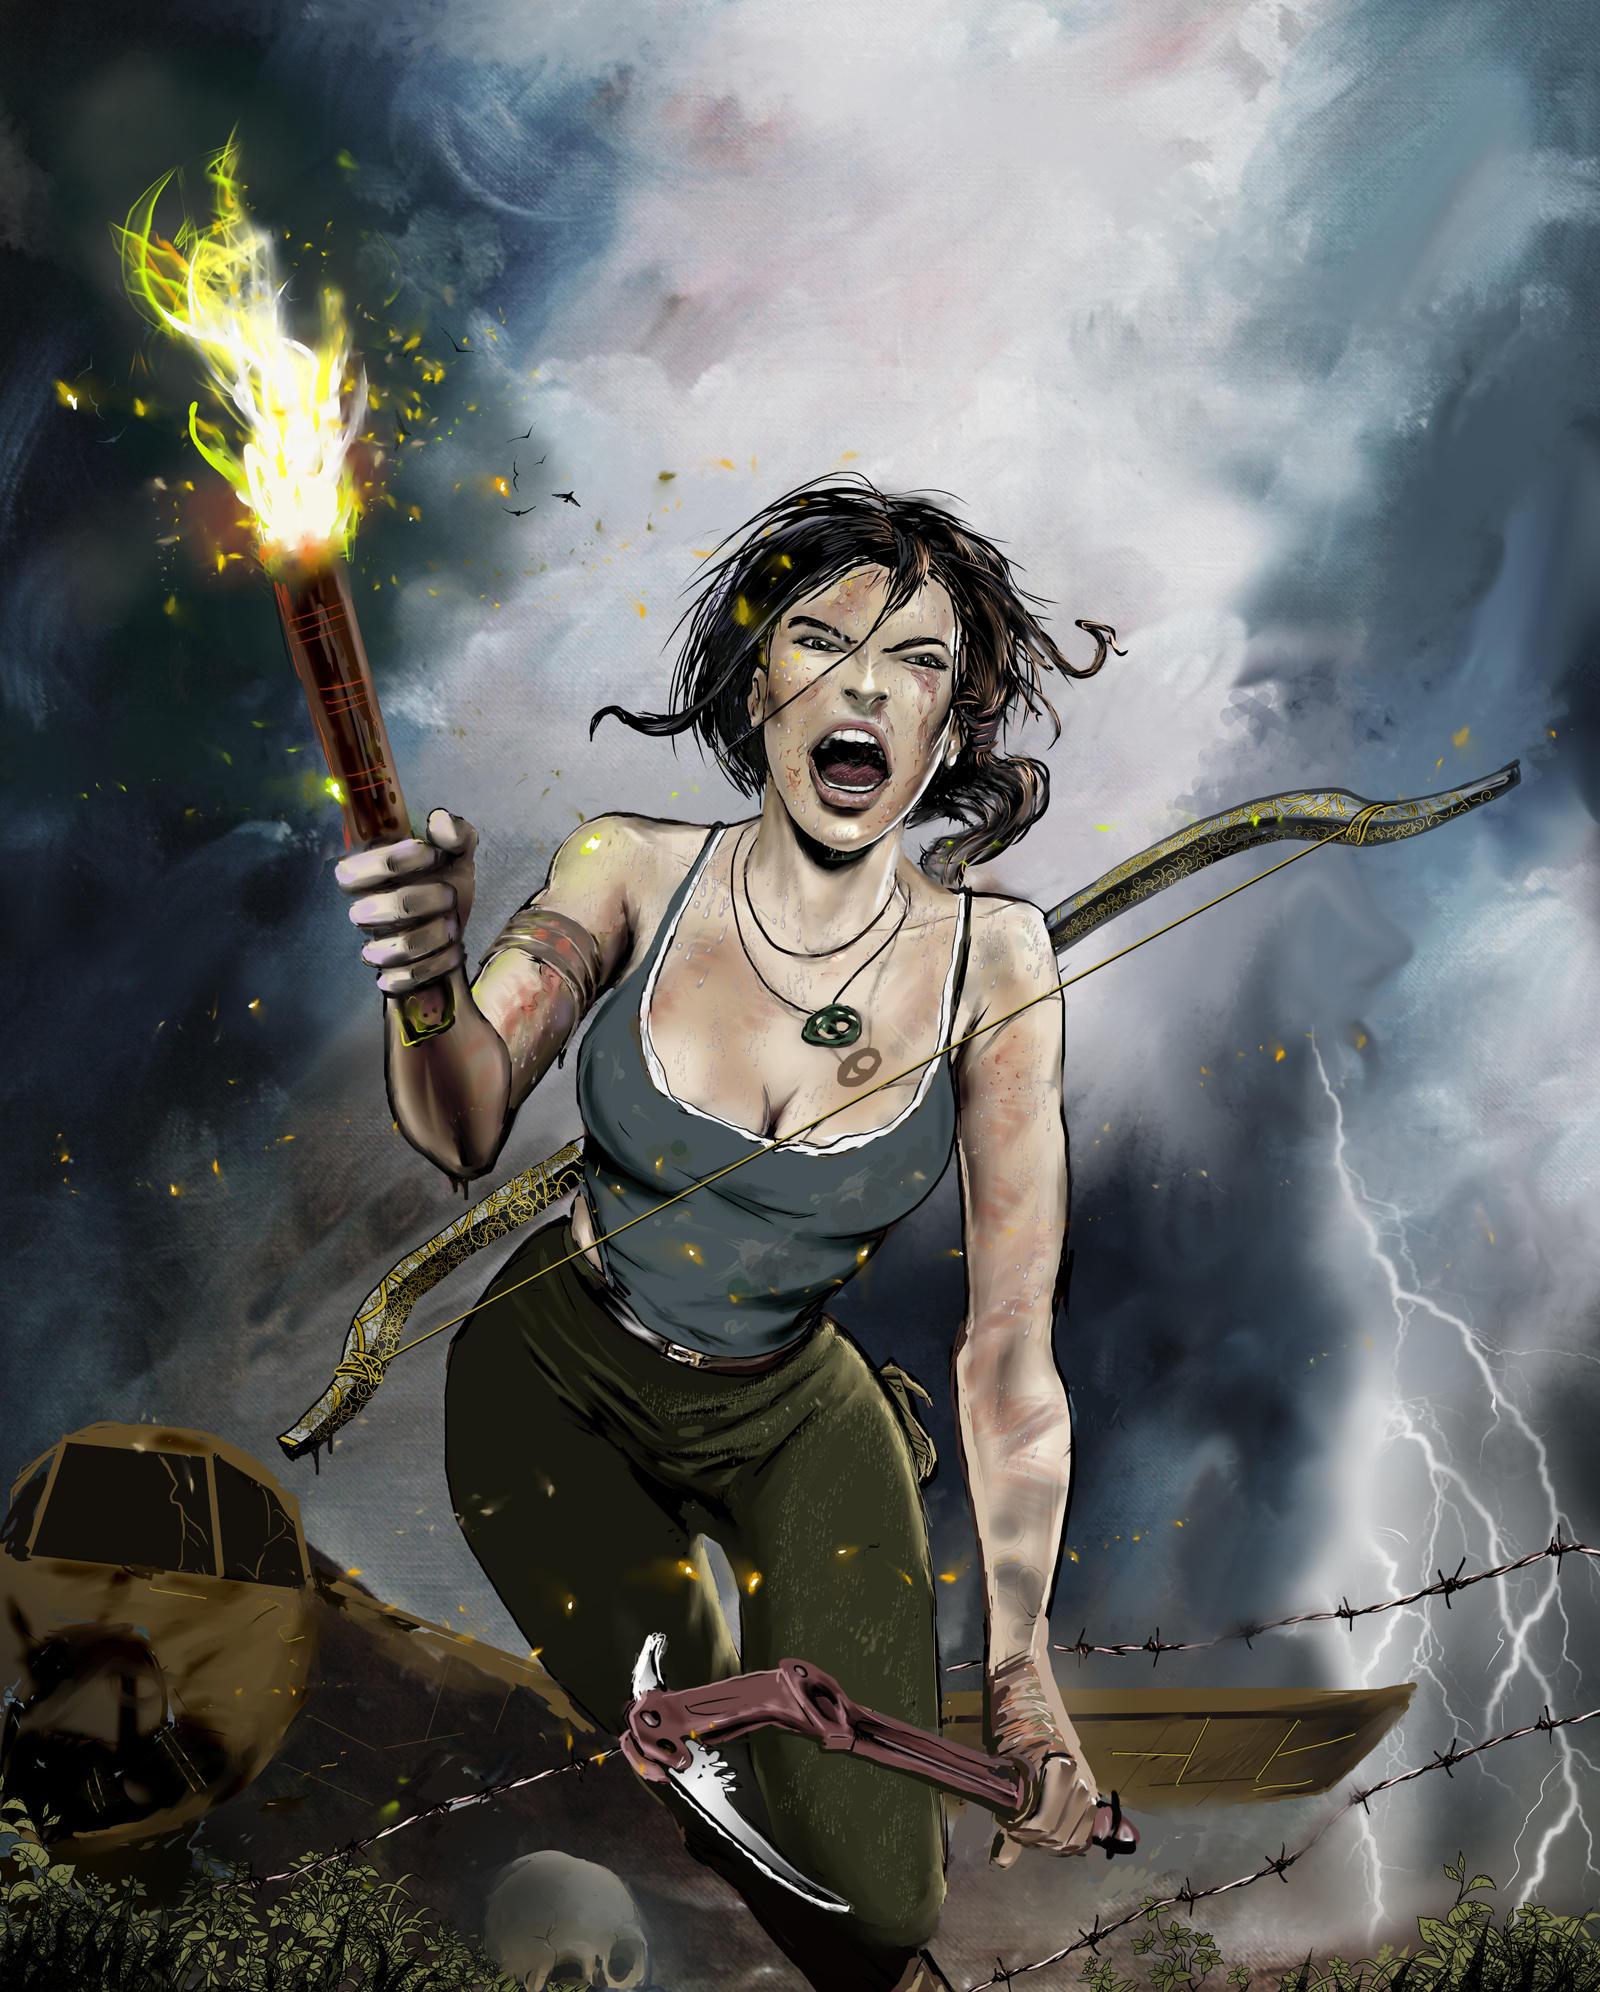 Tomb Raider 2013 Wallpaper: Lara Croft Shout By 888toto On DeviantArt